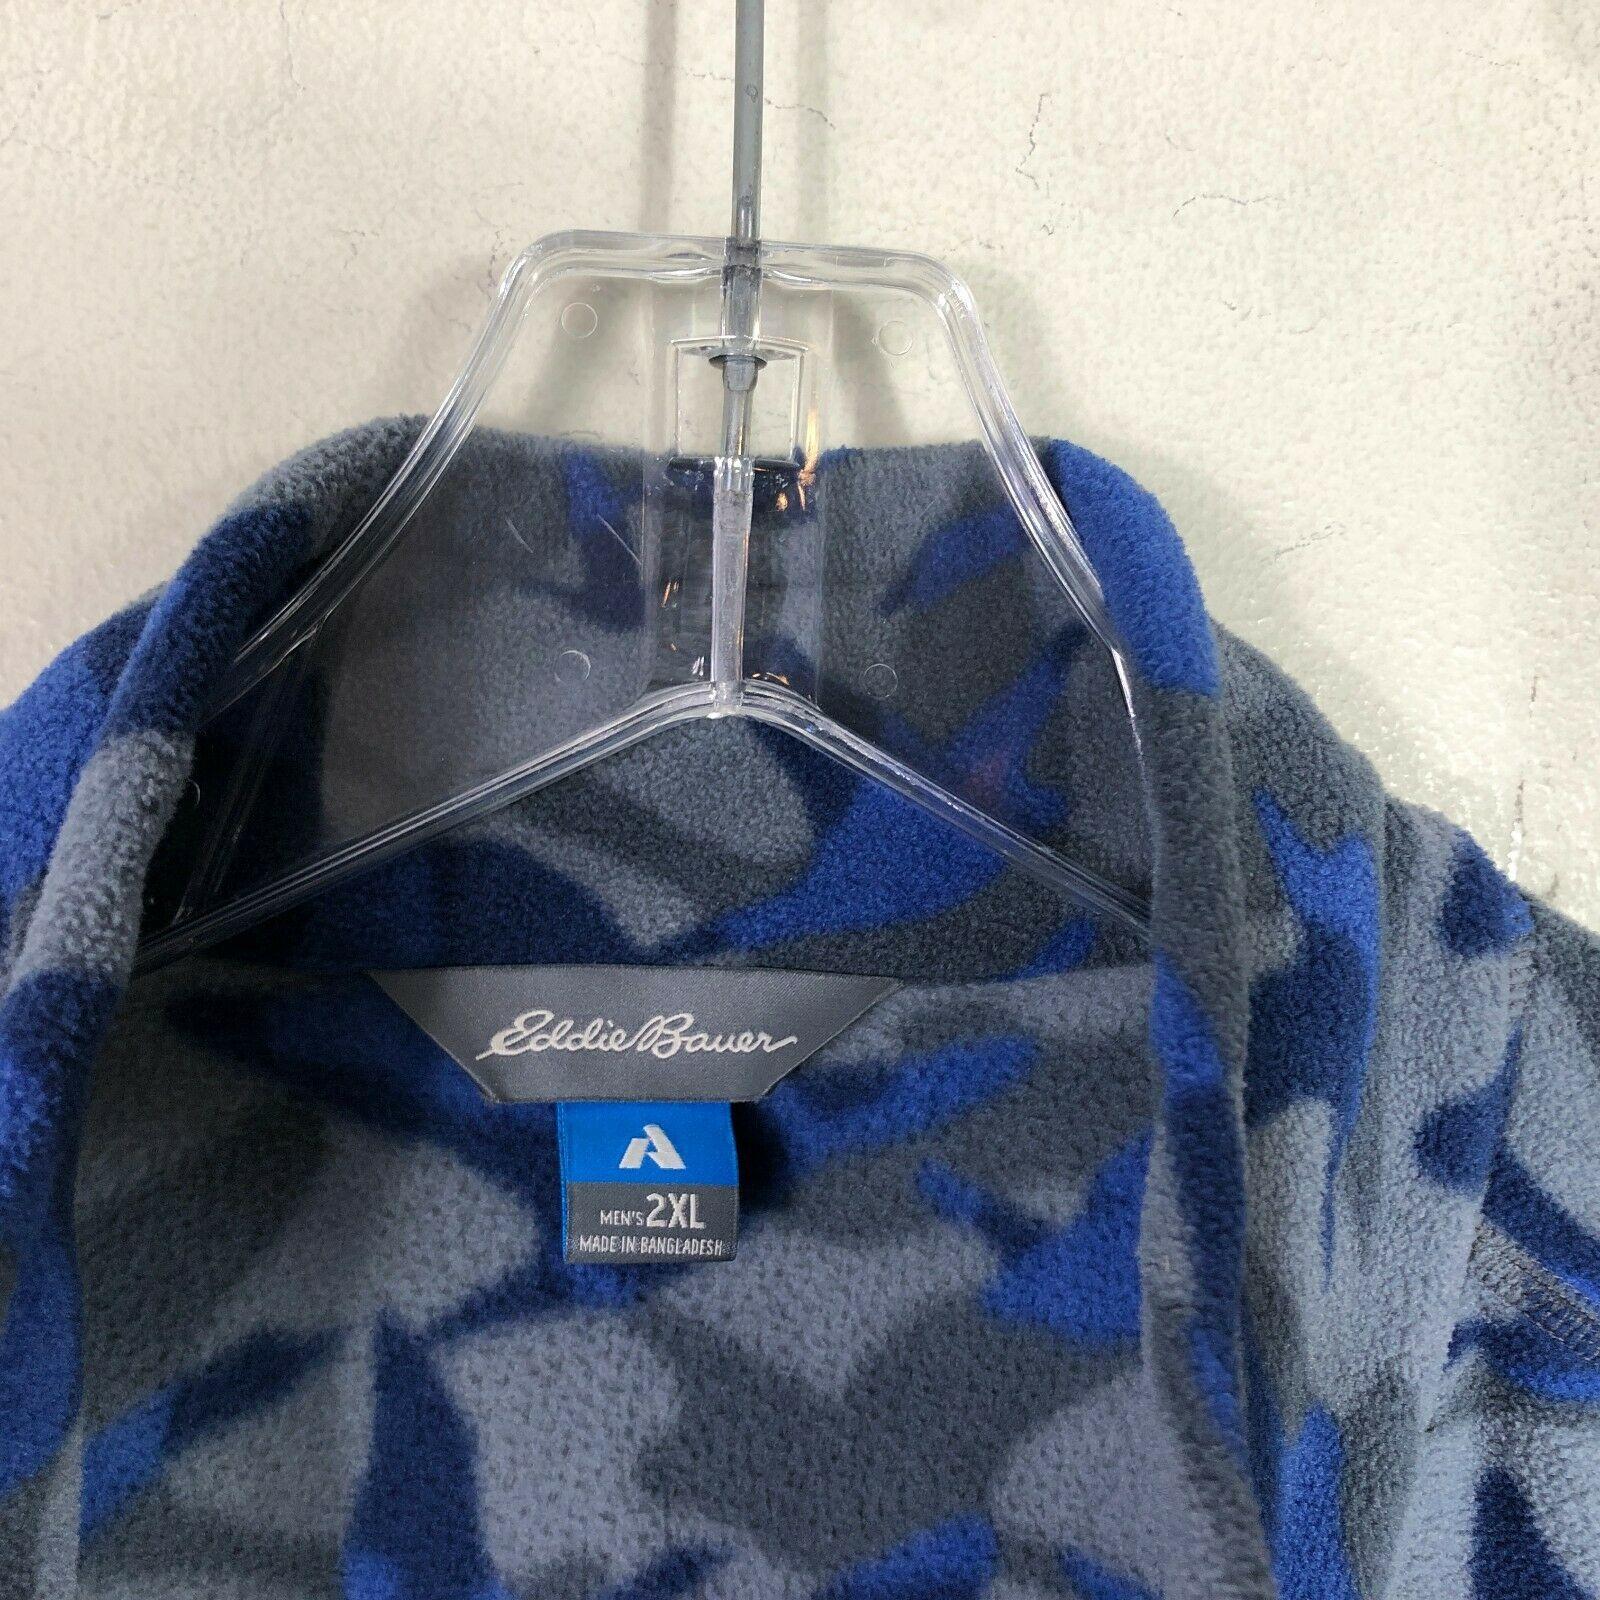 Eddie Bauer First Ascent Fleece Jacket 1/2 Zip Men's 2XL Blue Gray Long Sleeve image 12